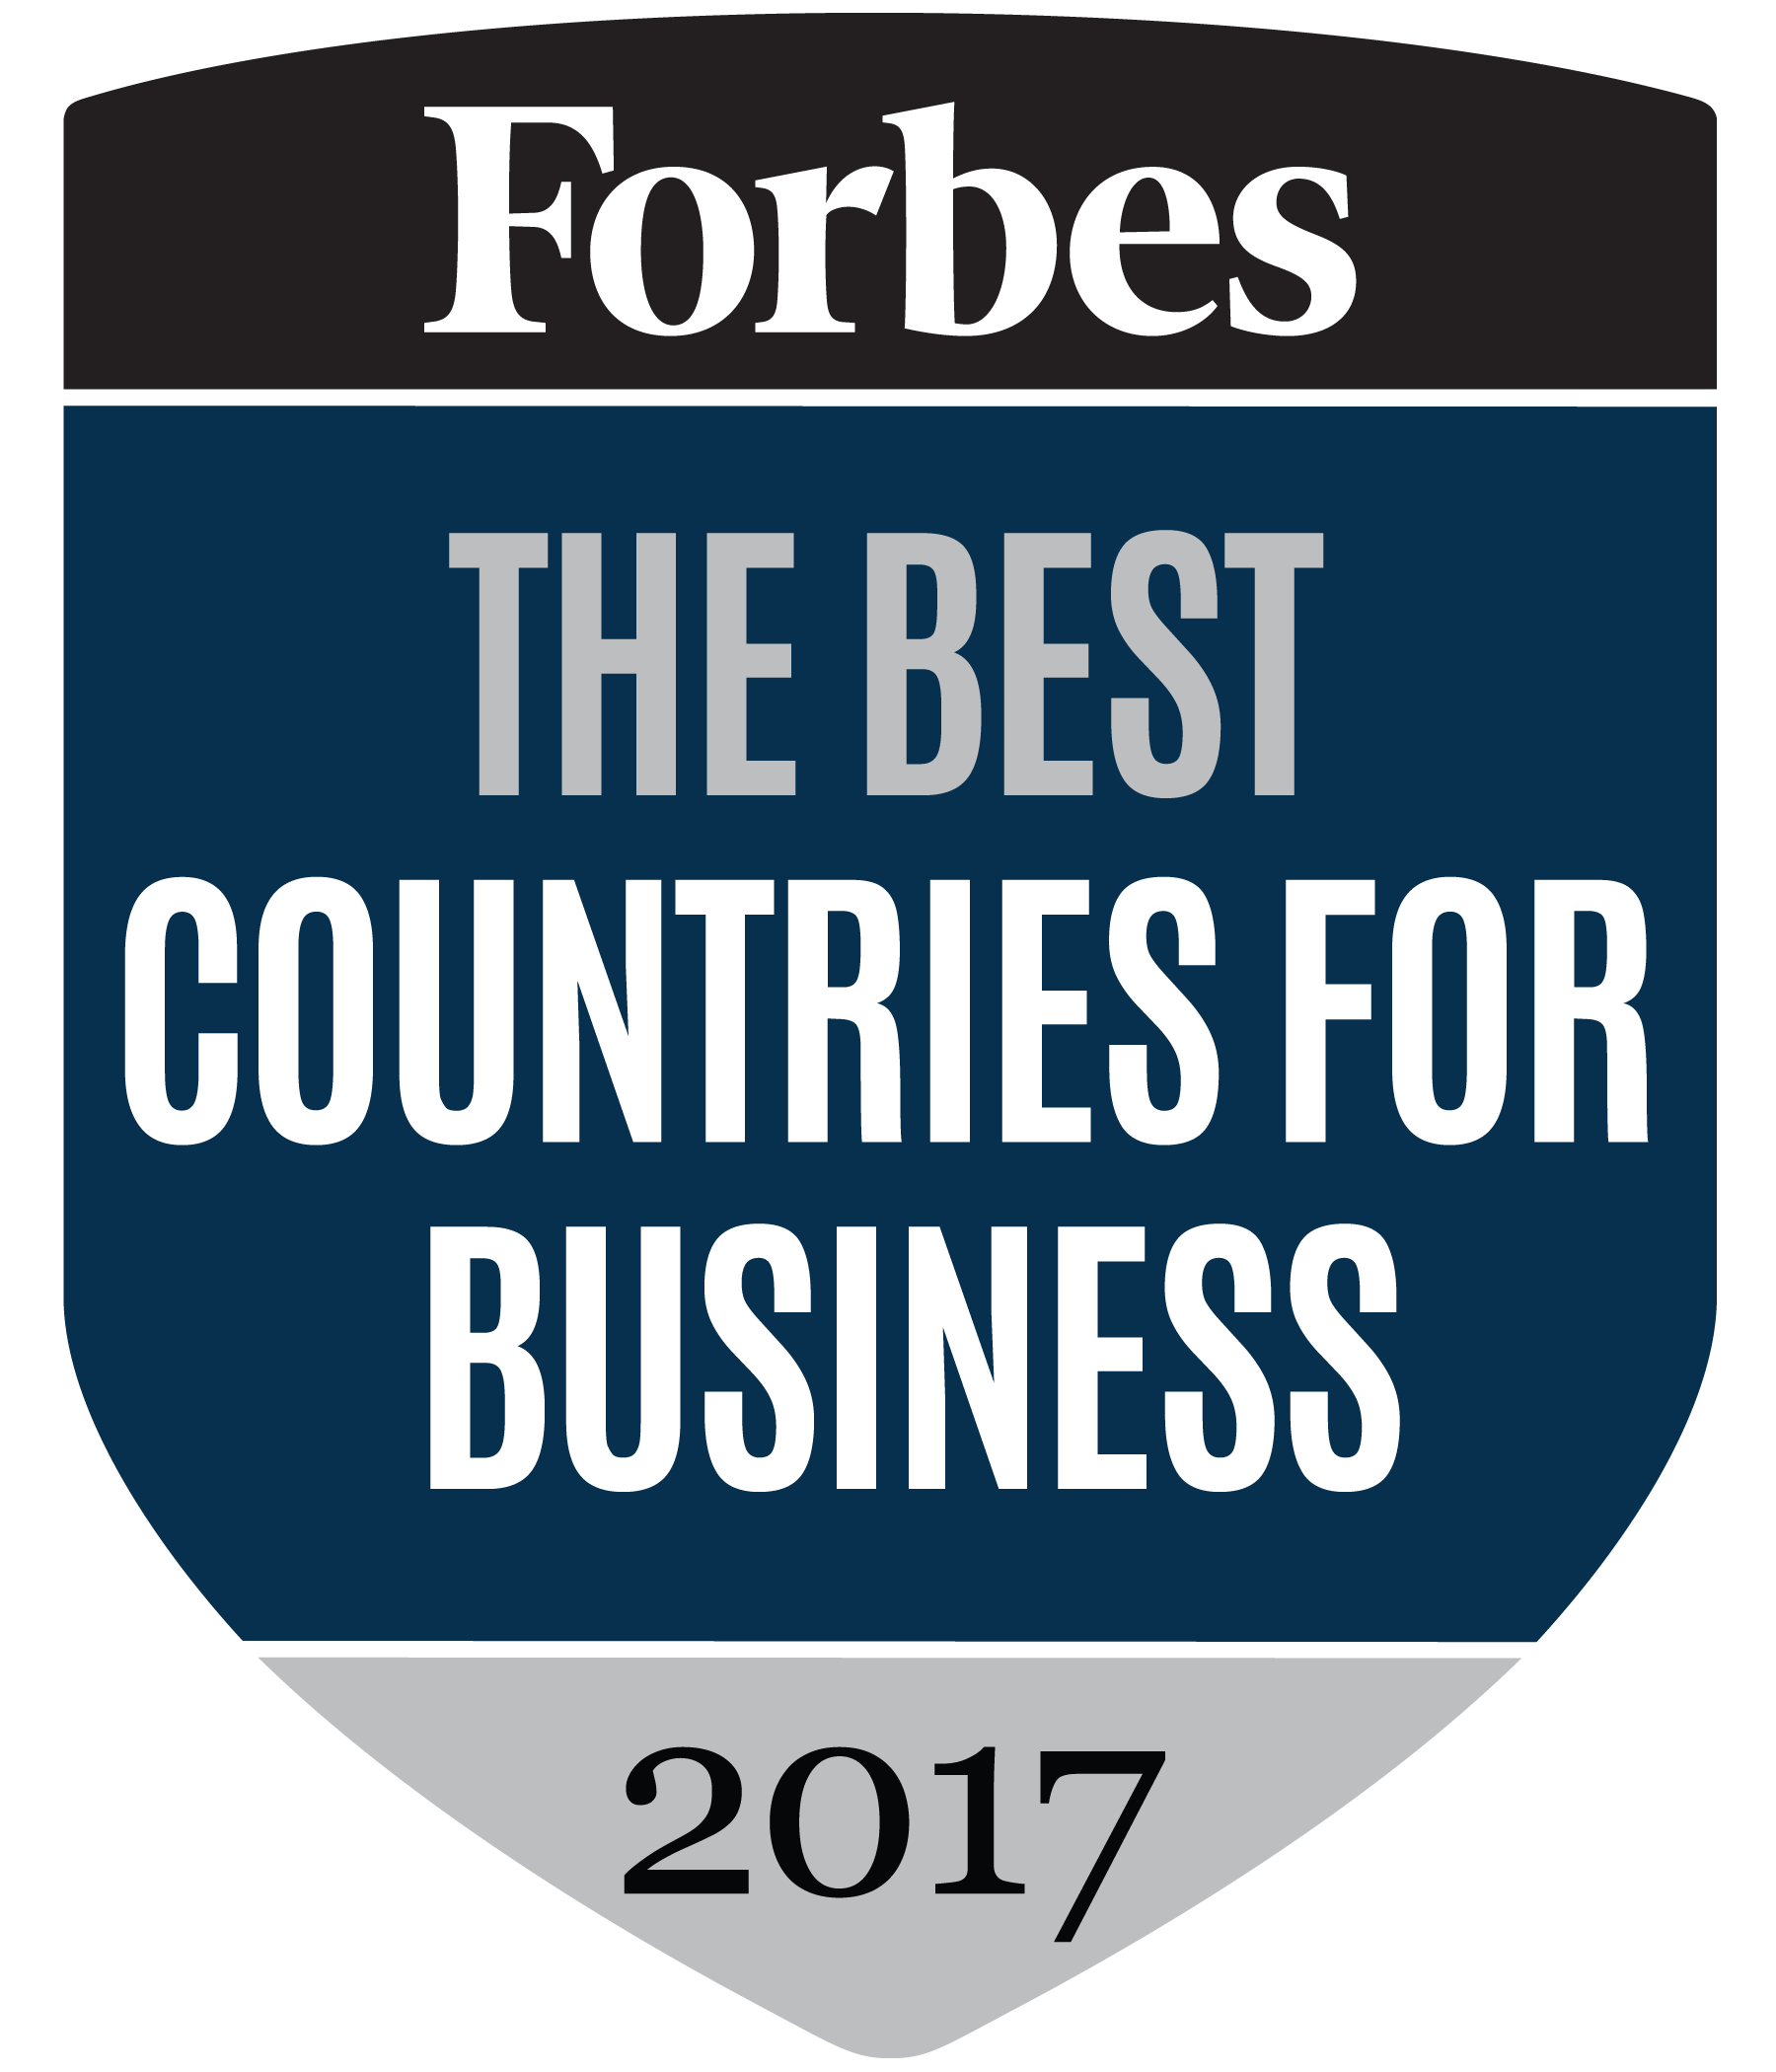 Канада превосходна  для бизнеса